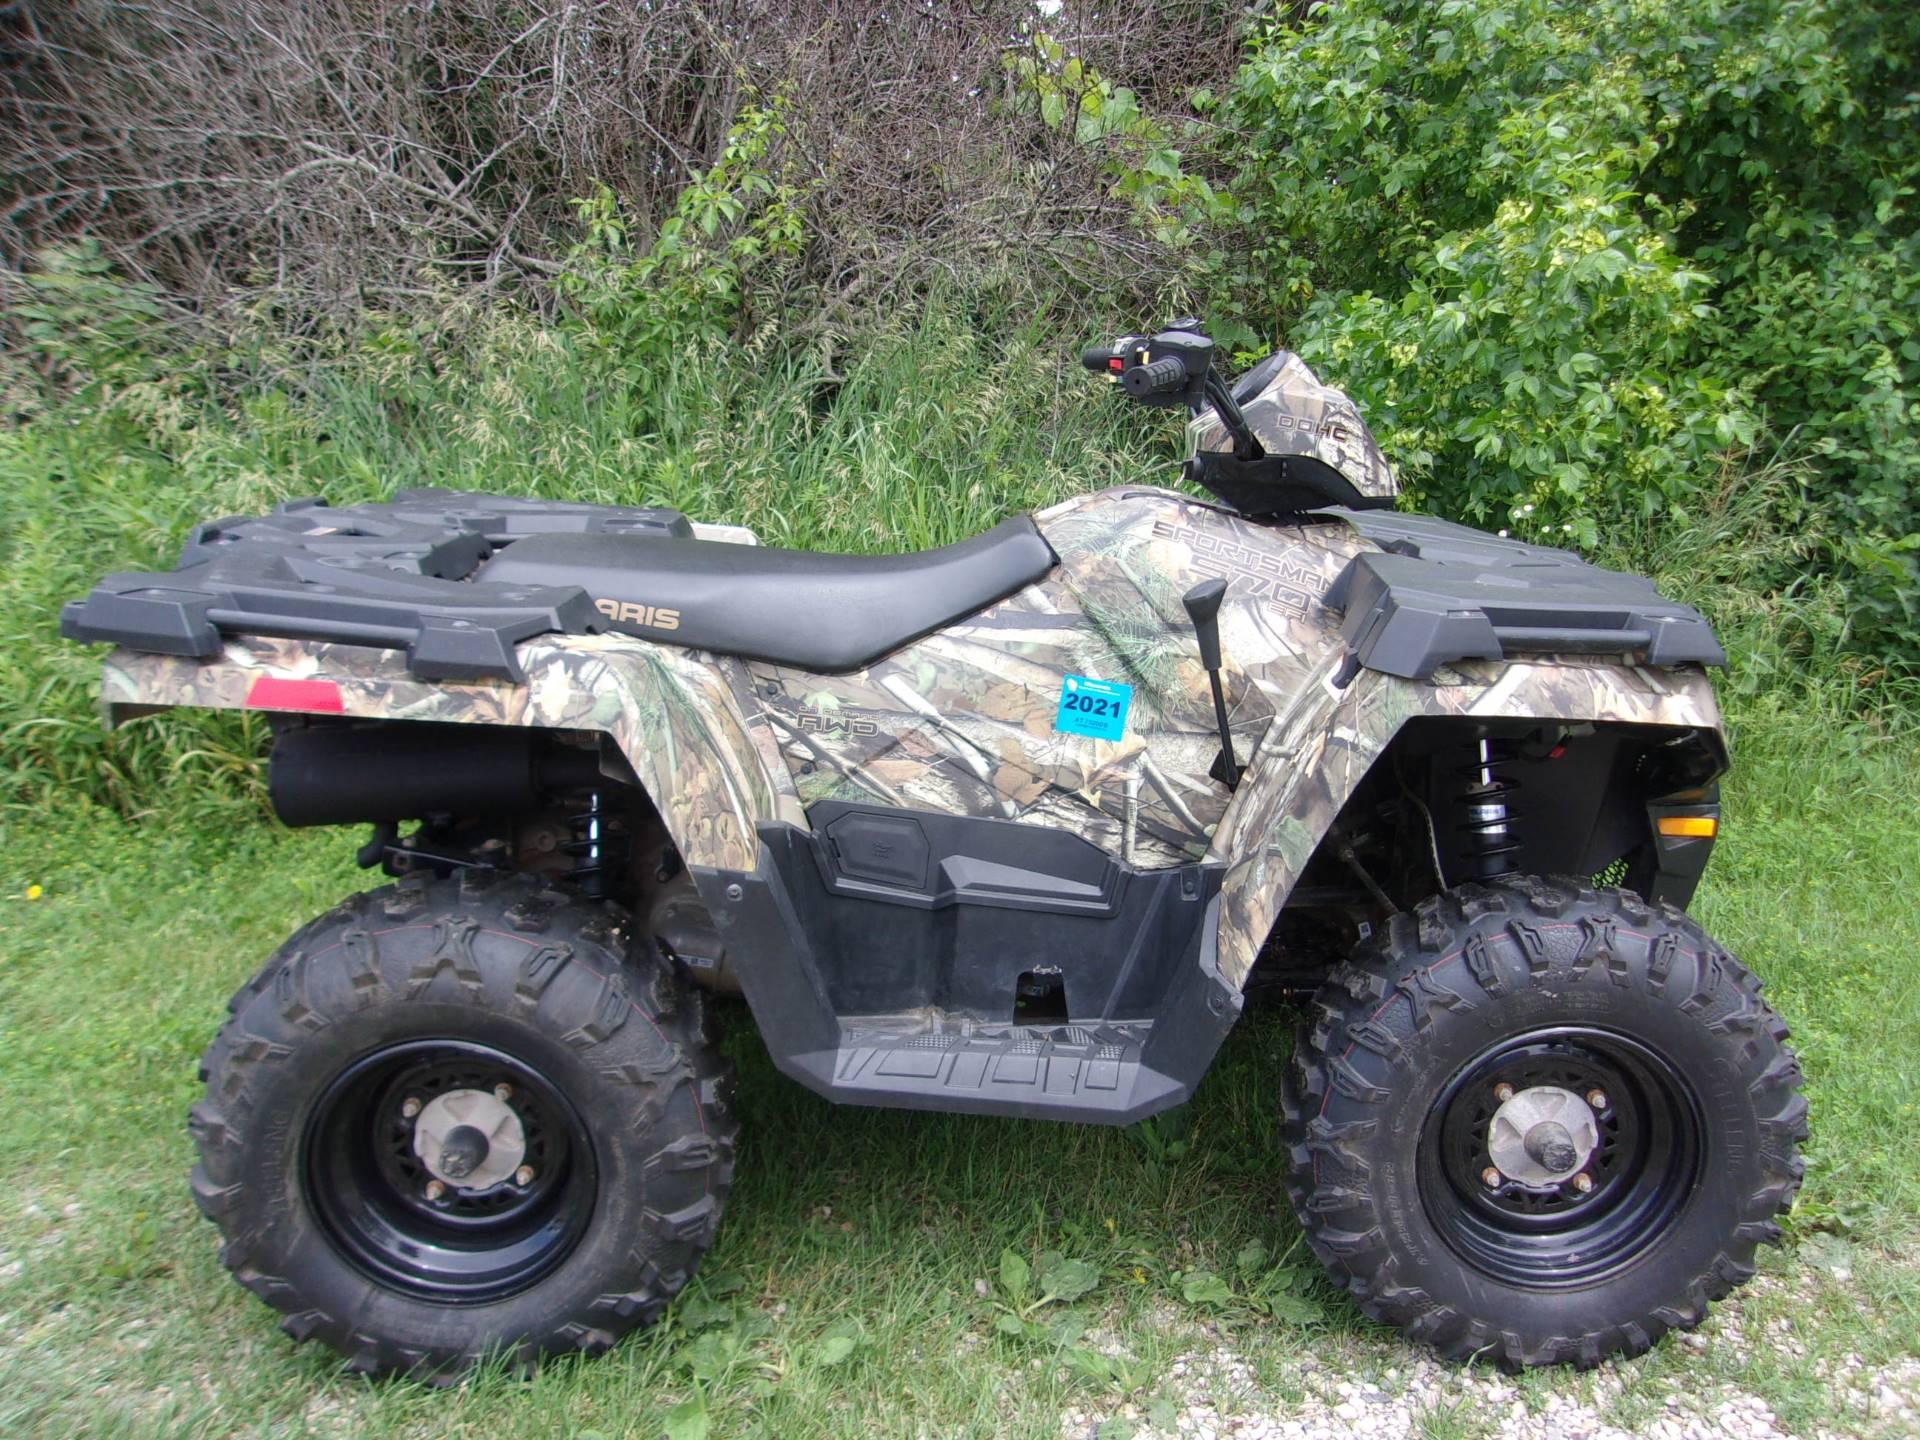 2015 Polaris Sportsman® 570 in Mukwonago, Wisconsin